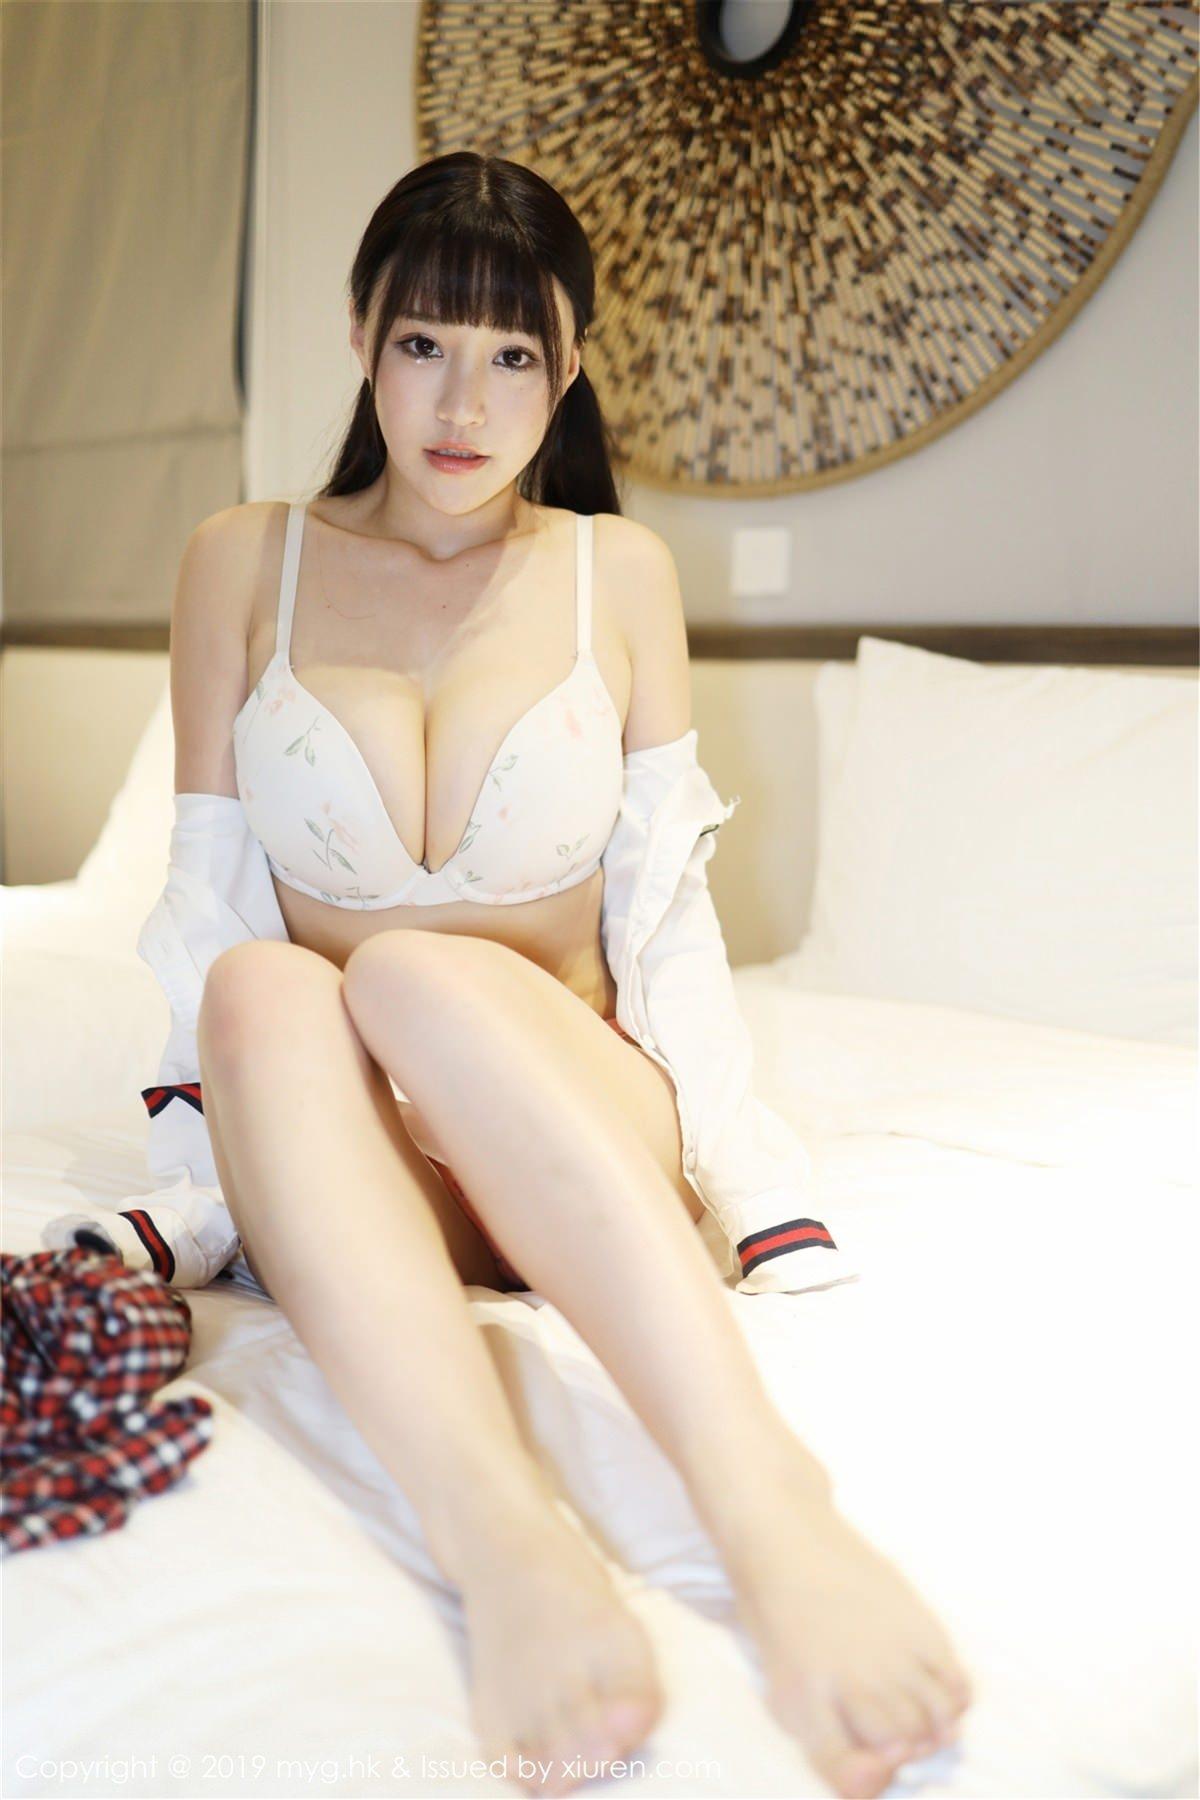 MyGirl Vol.363 11P, mygirl, Zhu Ke Er